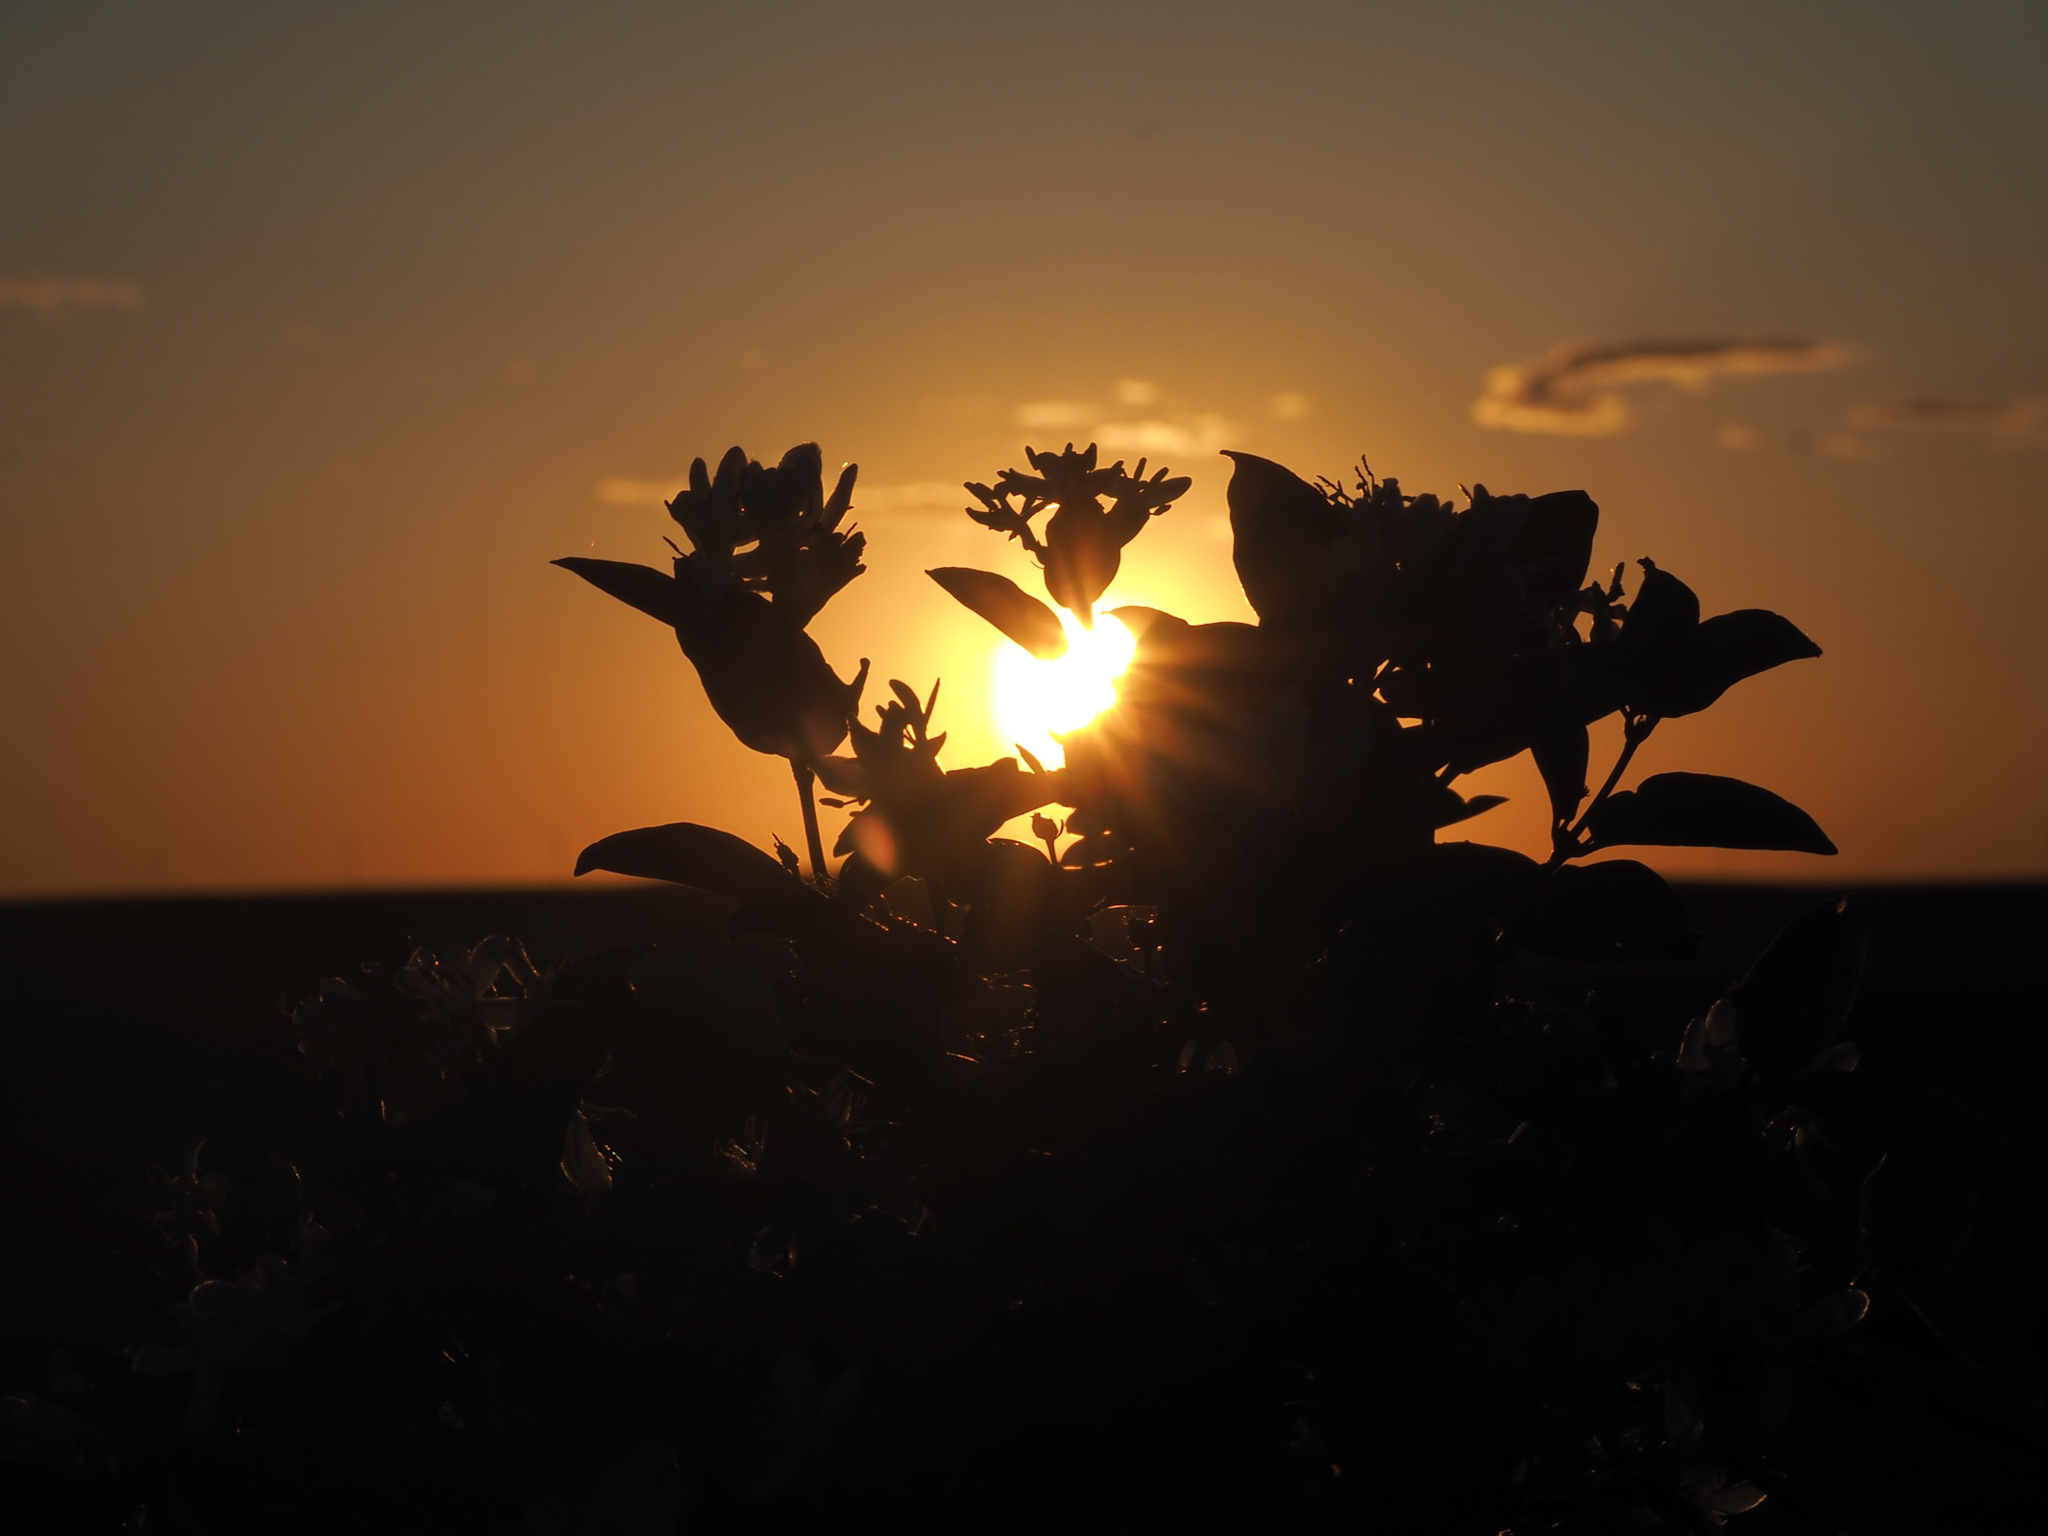 Saskatchewan Sunset 3 - Kevin Haggkvist